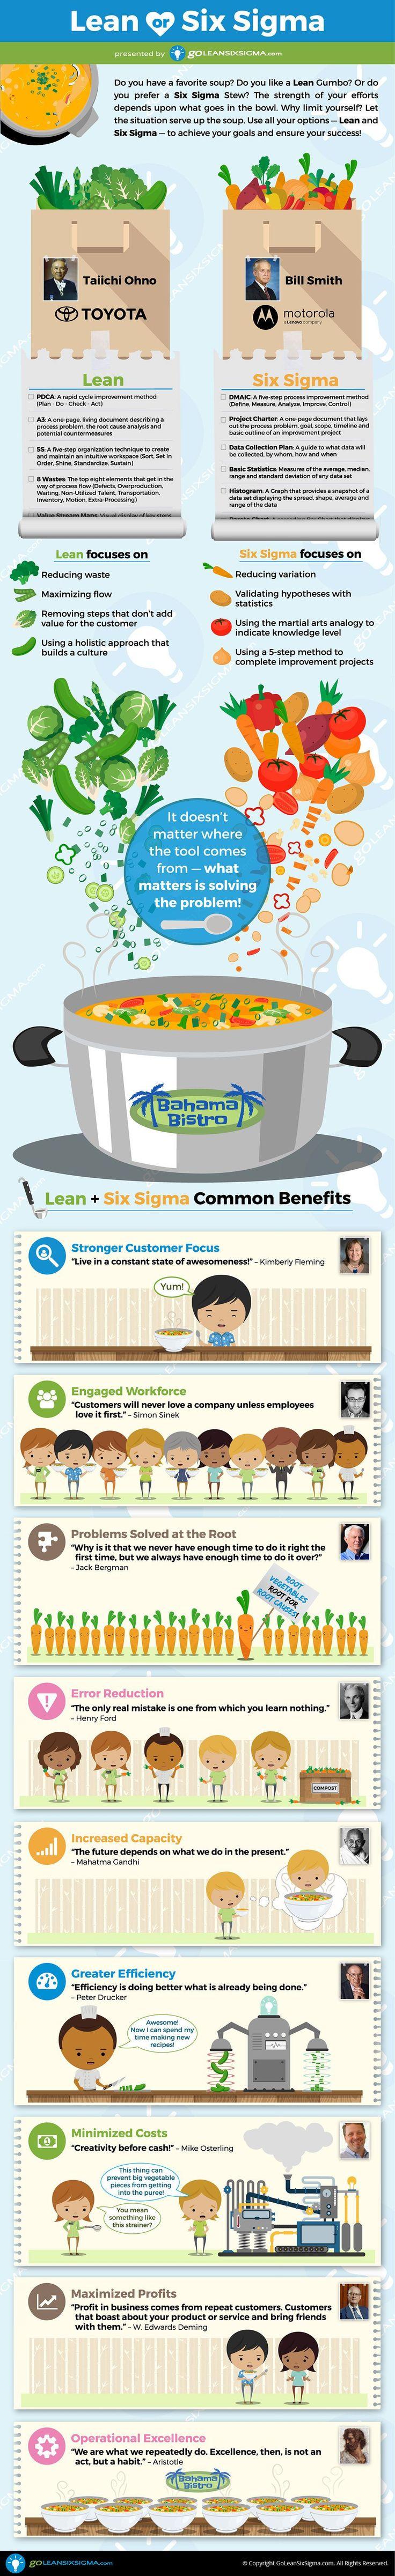 Lean or Six Sigma Infographic - GoLeanSixSigma.com